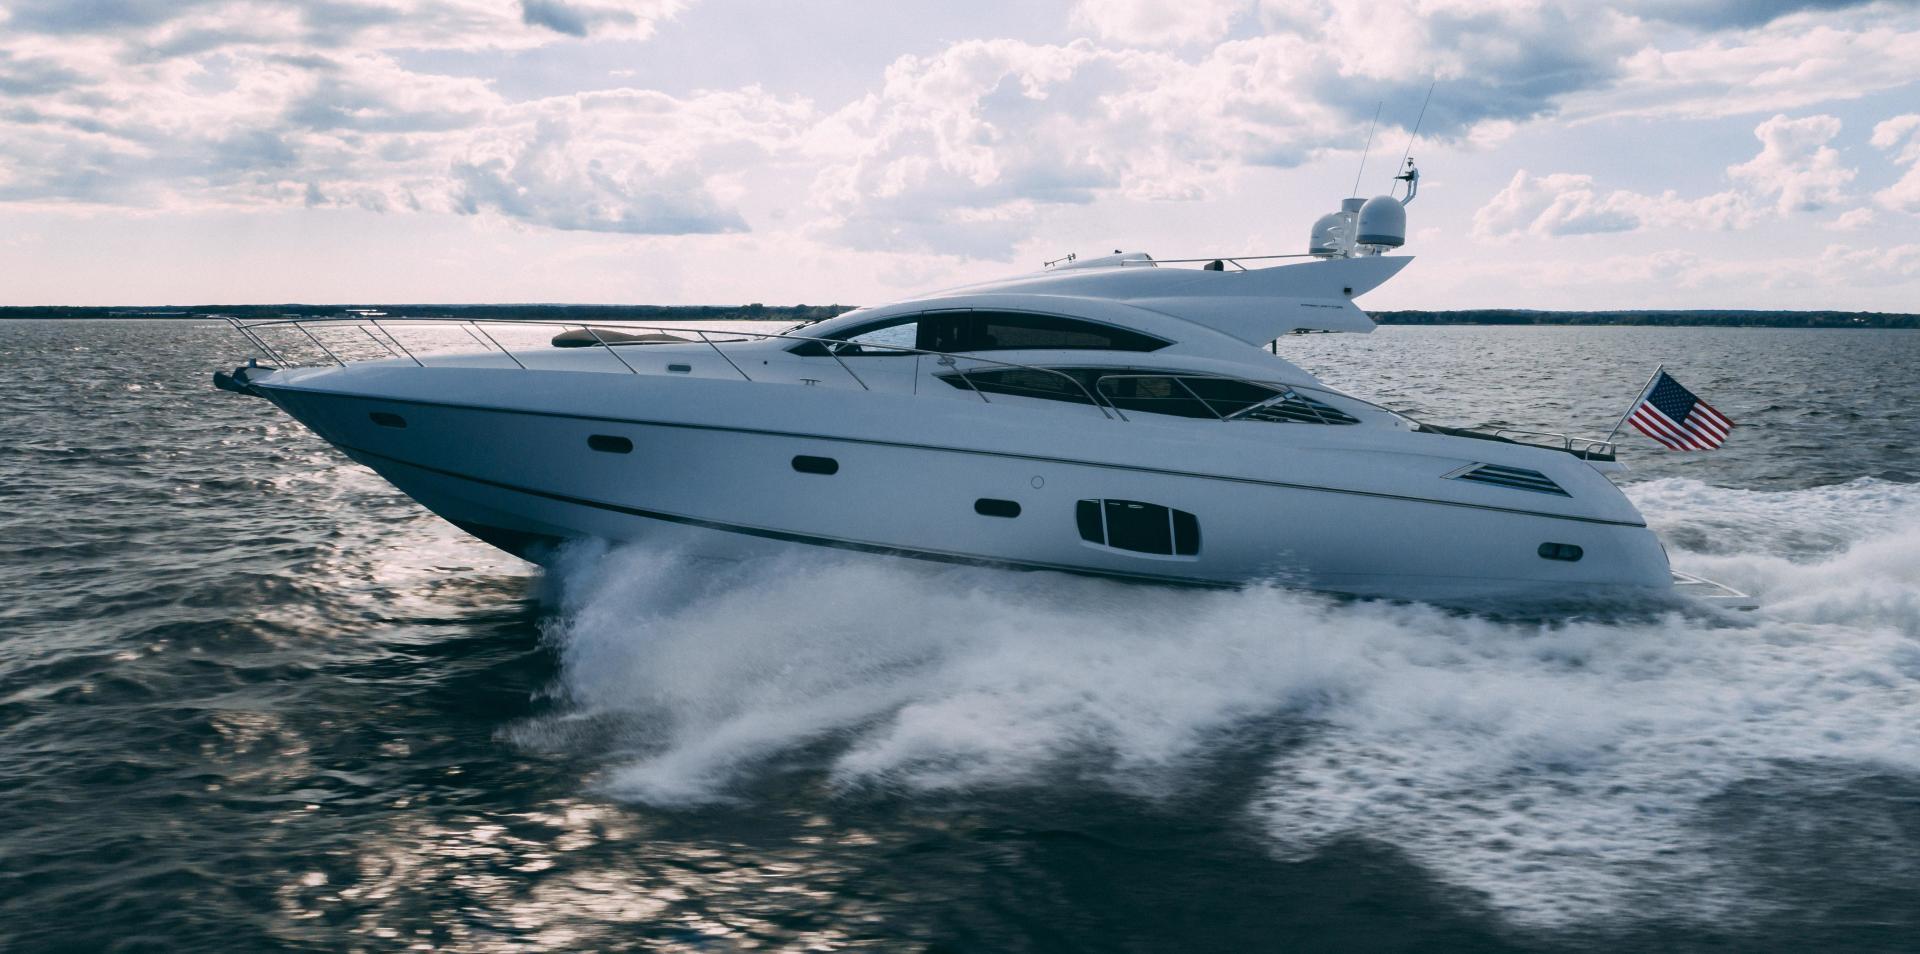 Sunseeker-Motor yacht 2012-JIMBO New Port-Rhode Island-United States-1480129   Thumbnail